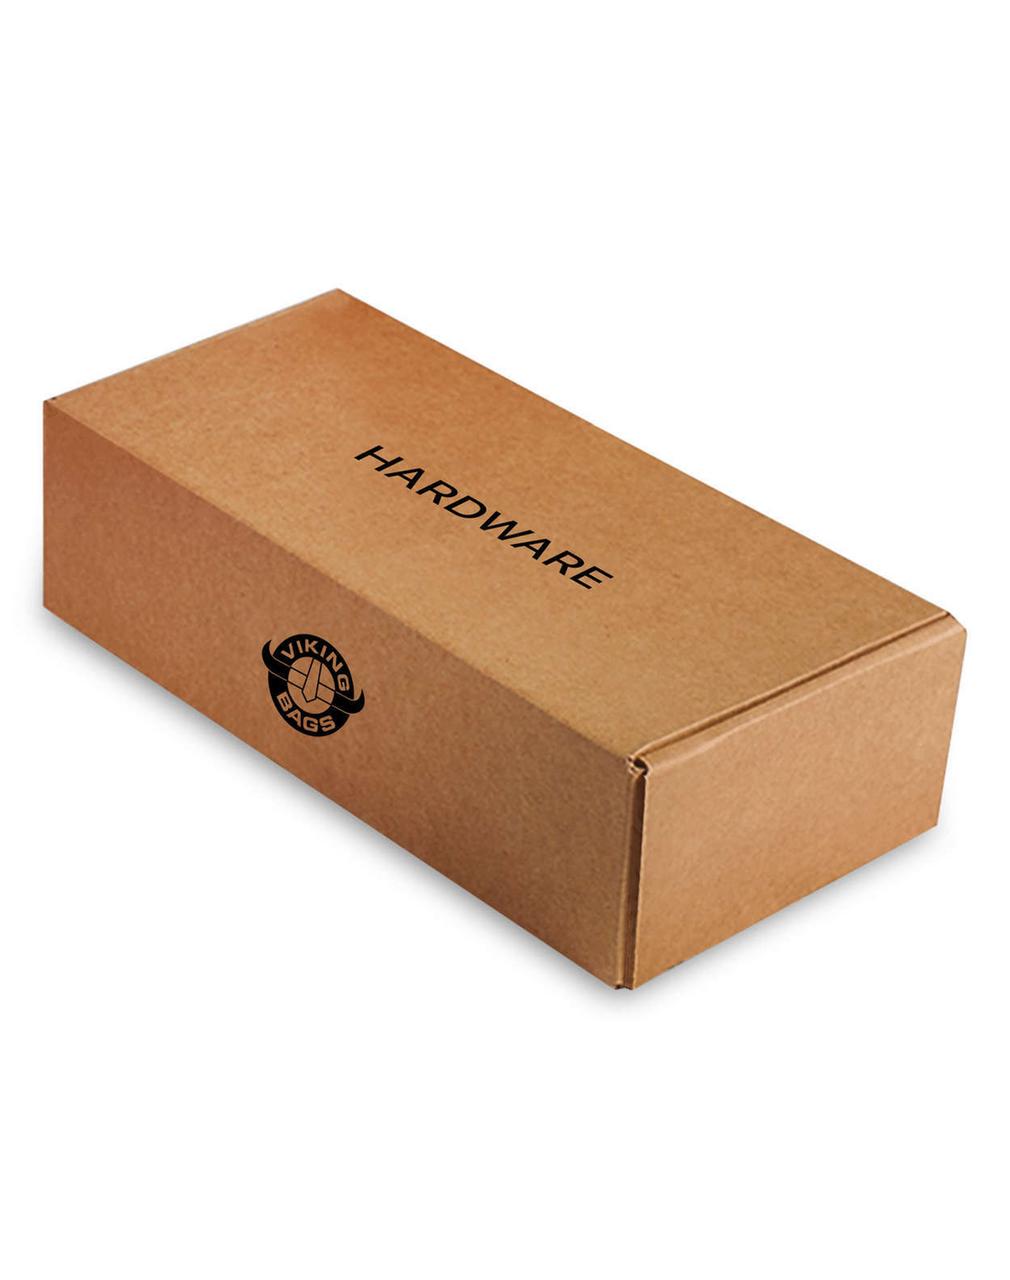 Triumph Rocket III Range Charger Single Strap Medium Motorcycle Saddlebags Box